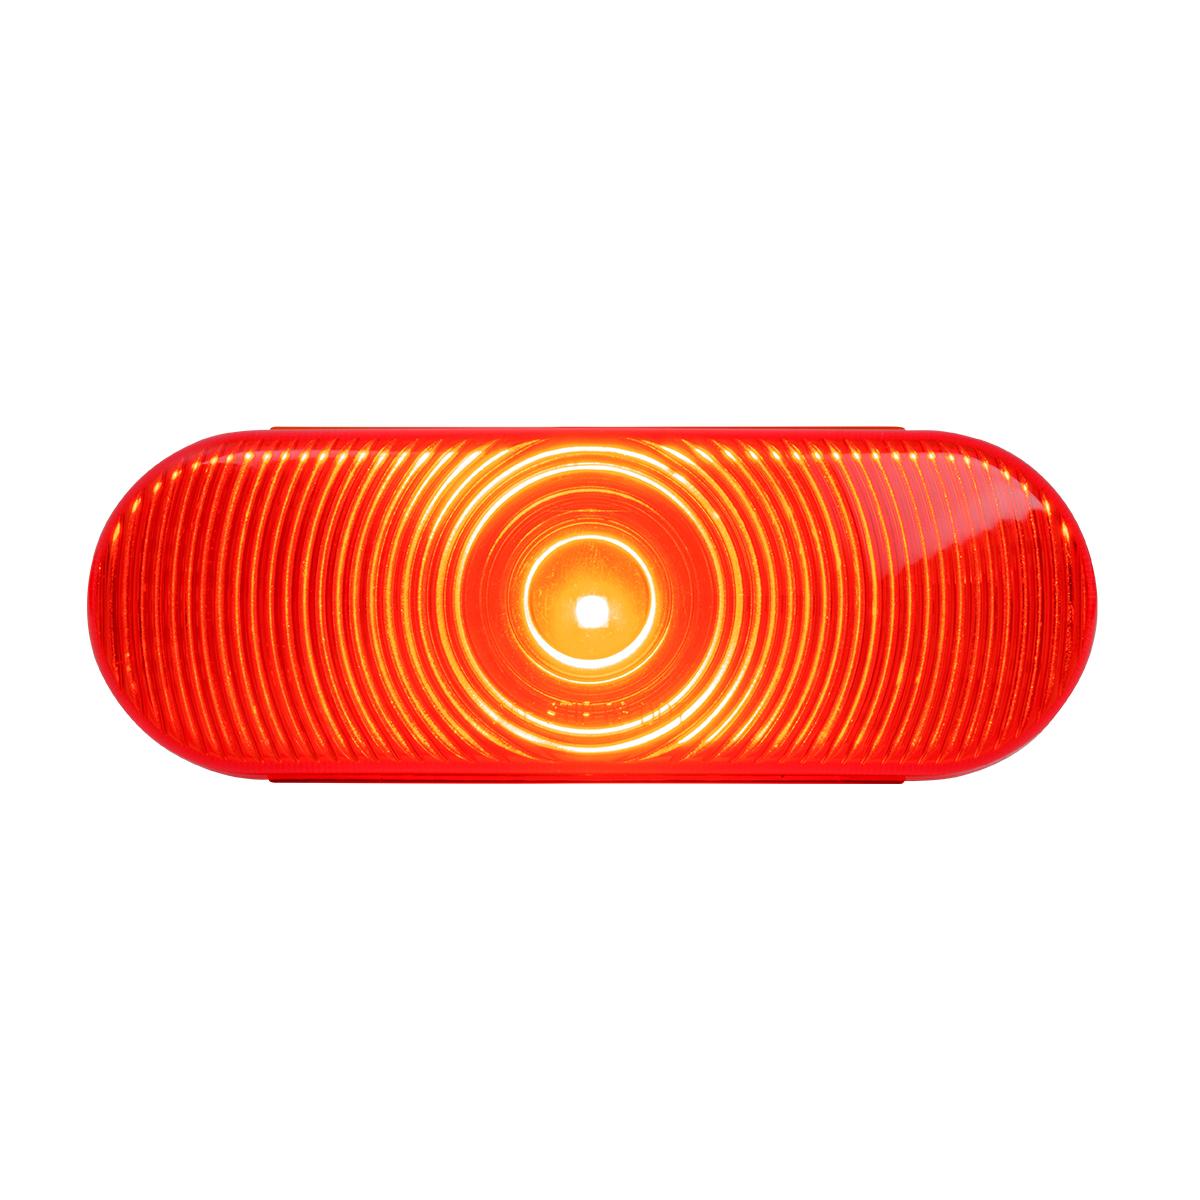 75851 Oval Single High Power LED Sealed Light